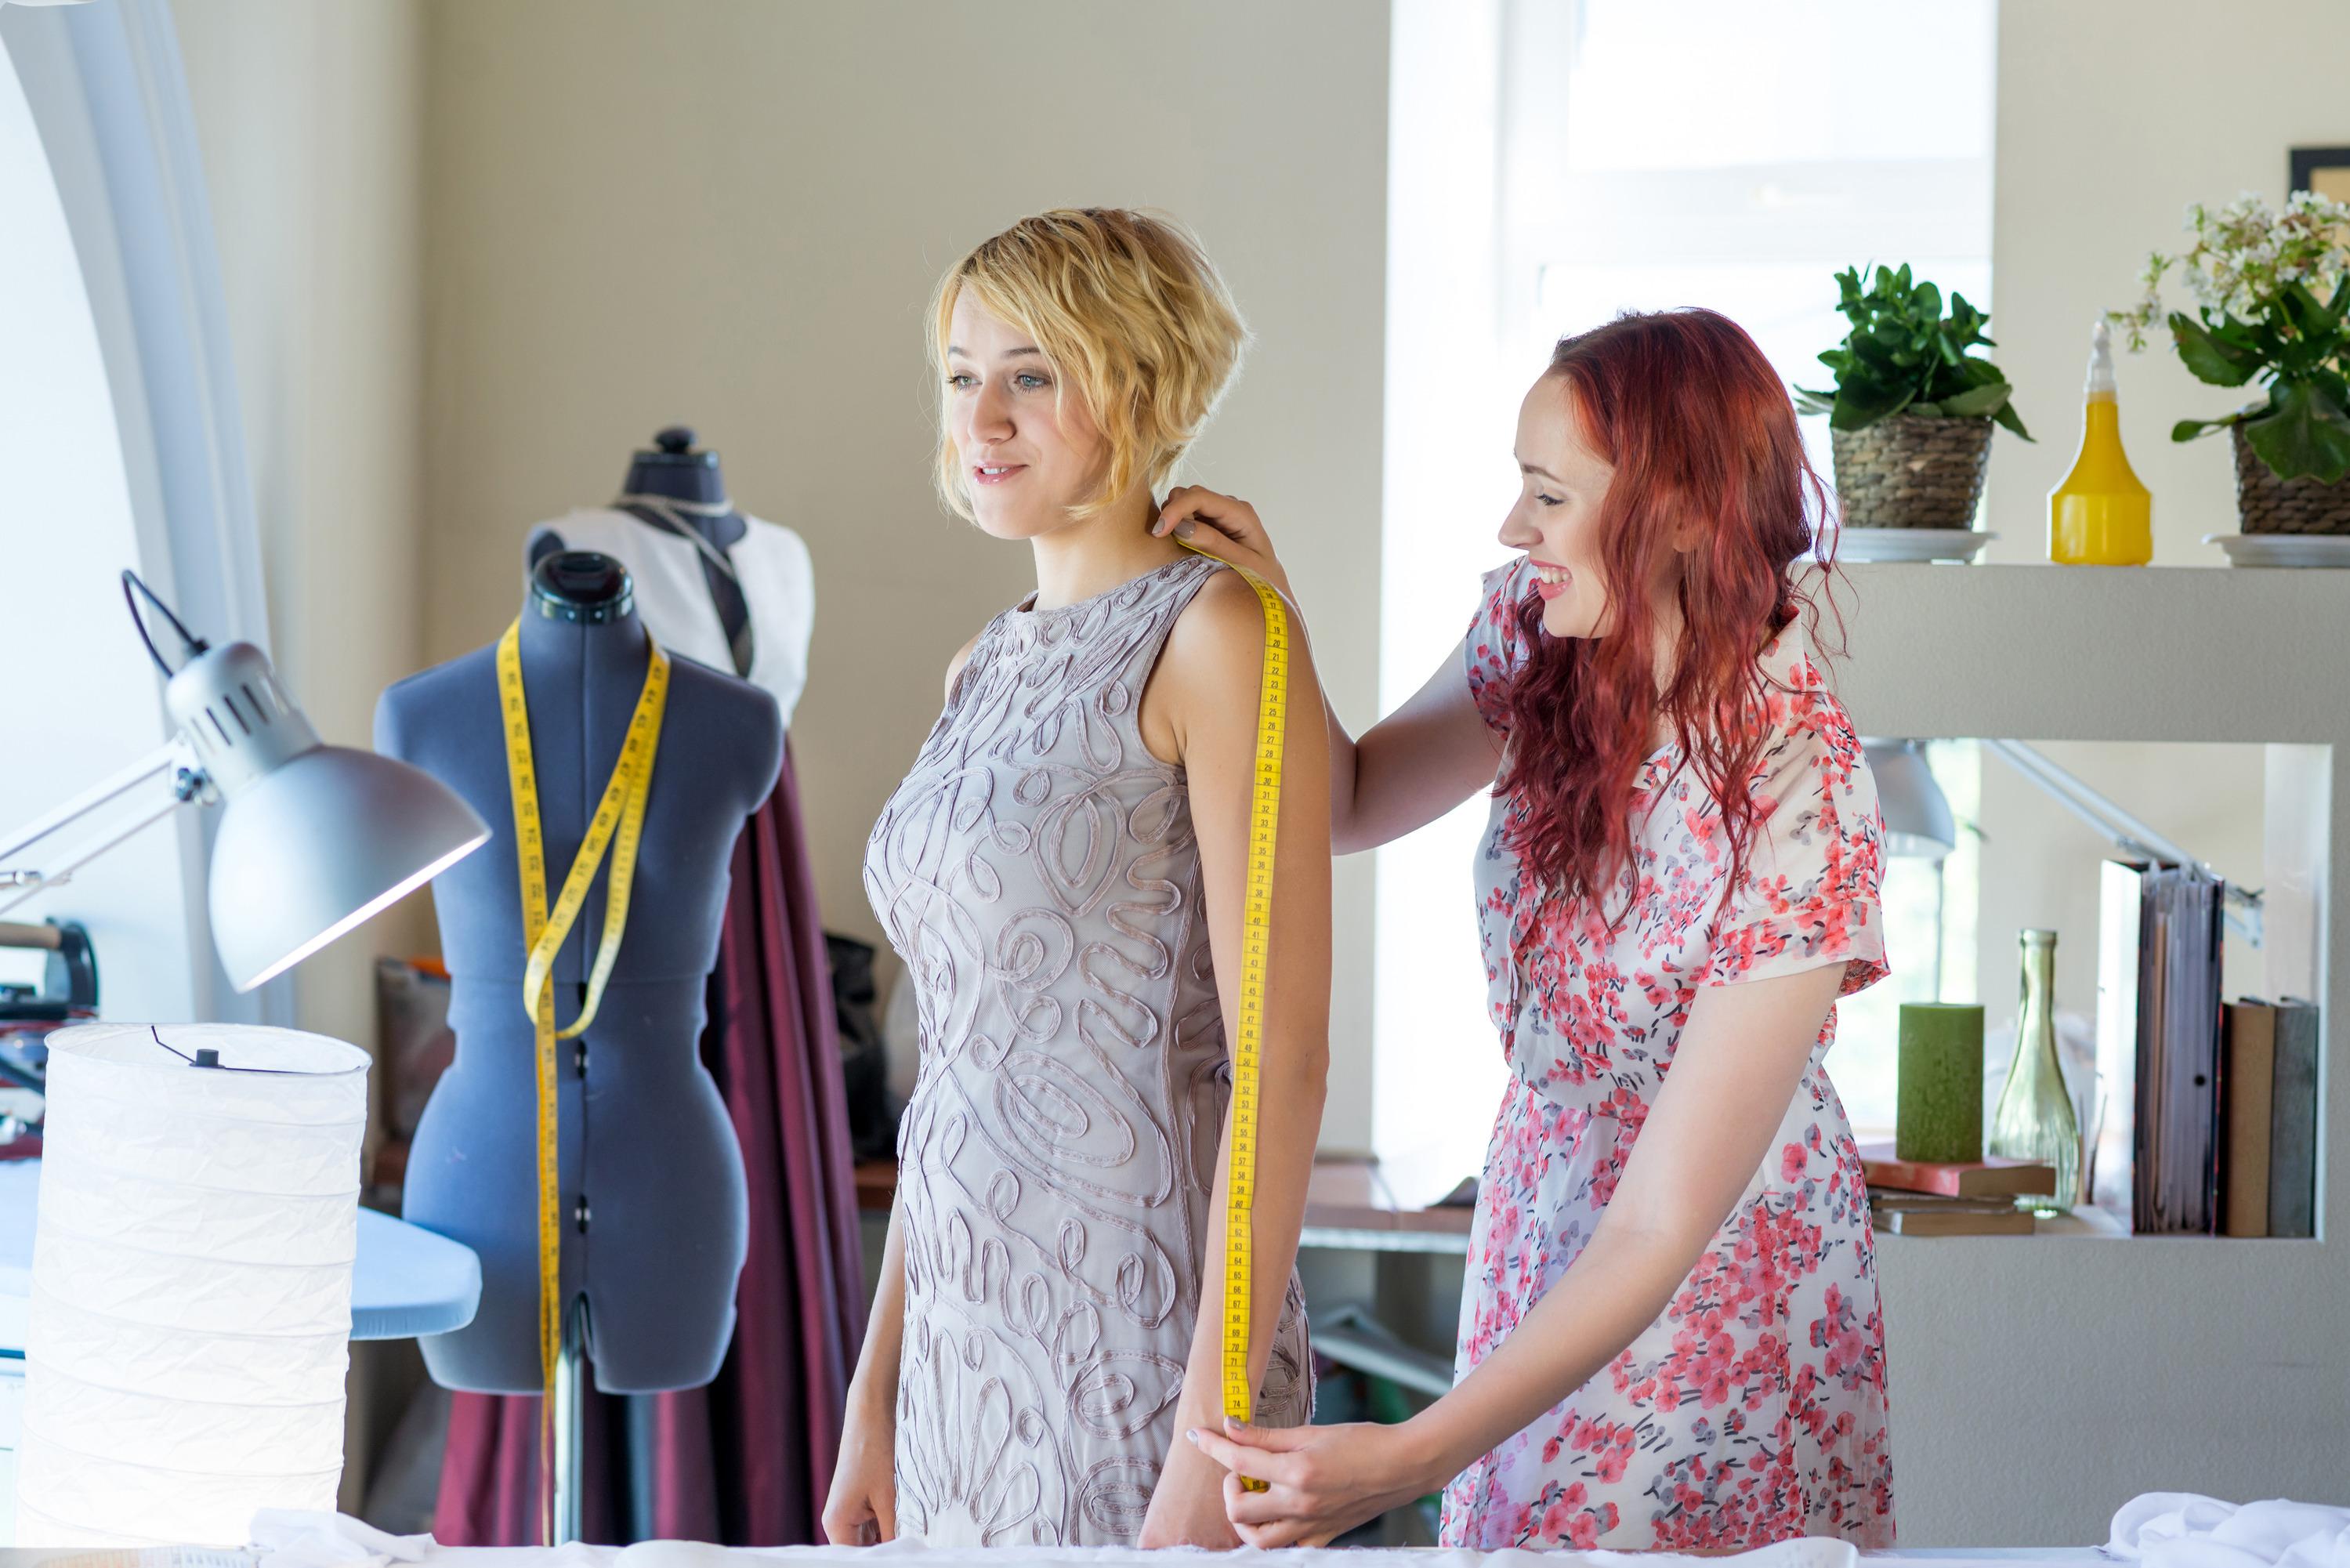 photodune-9910834-dressmaker-at-work-l